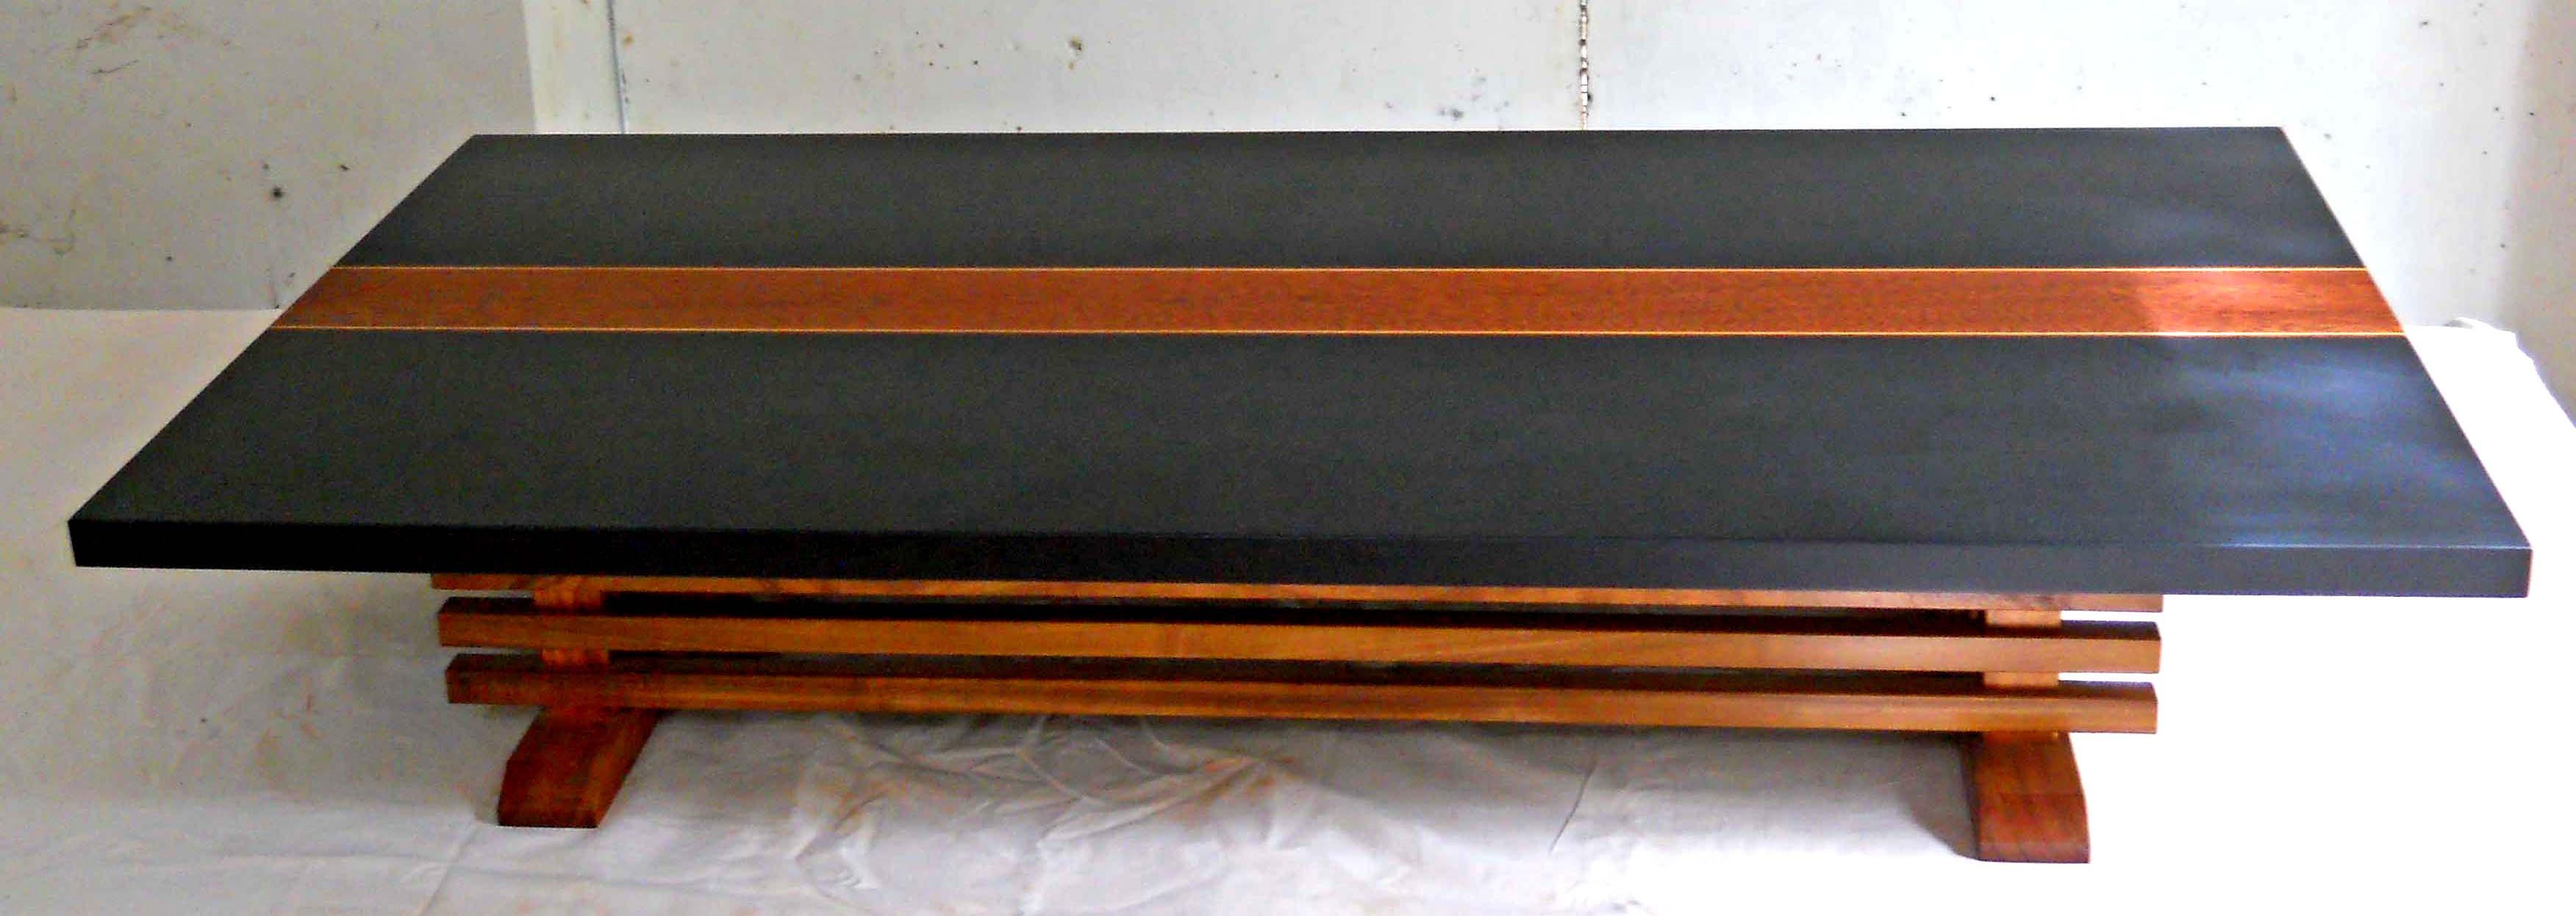 (027-B) Nakazuka table in Black